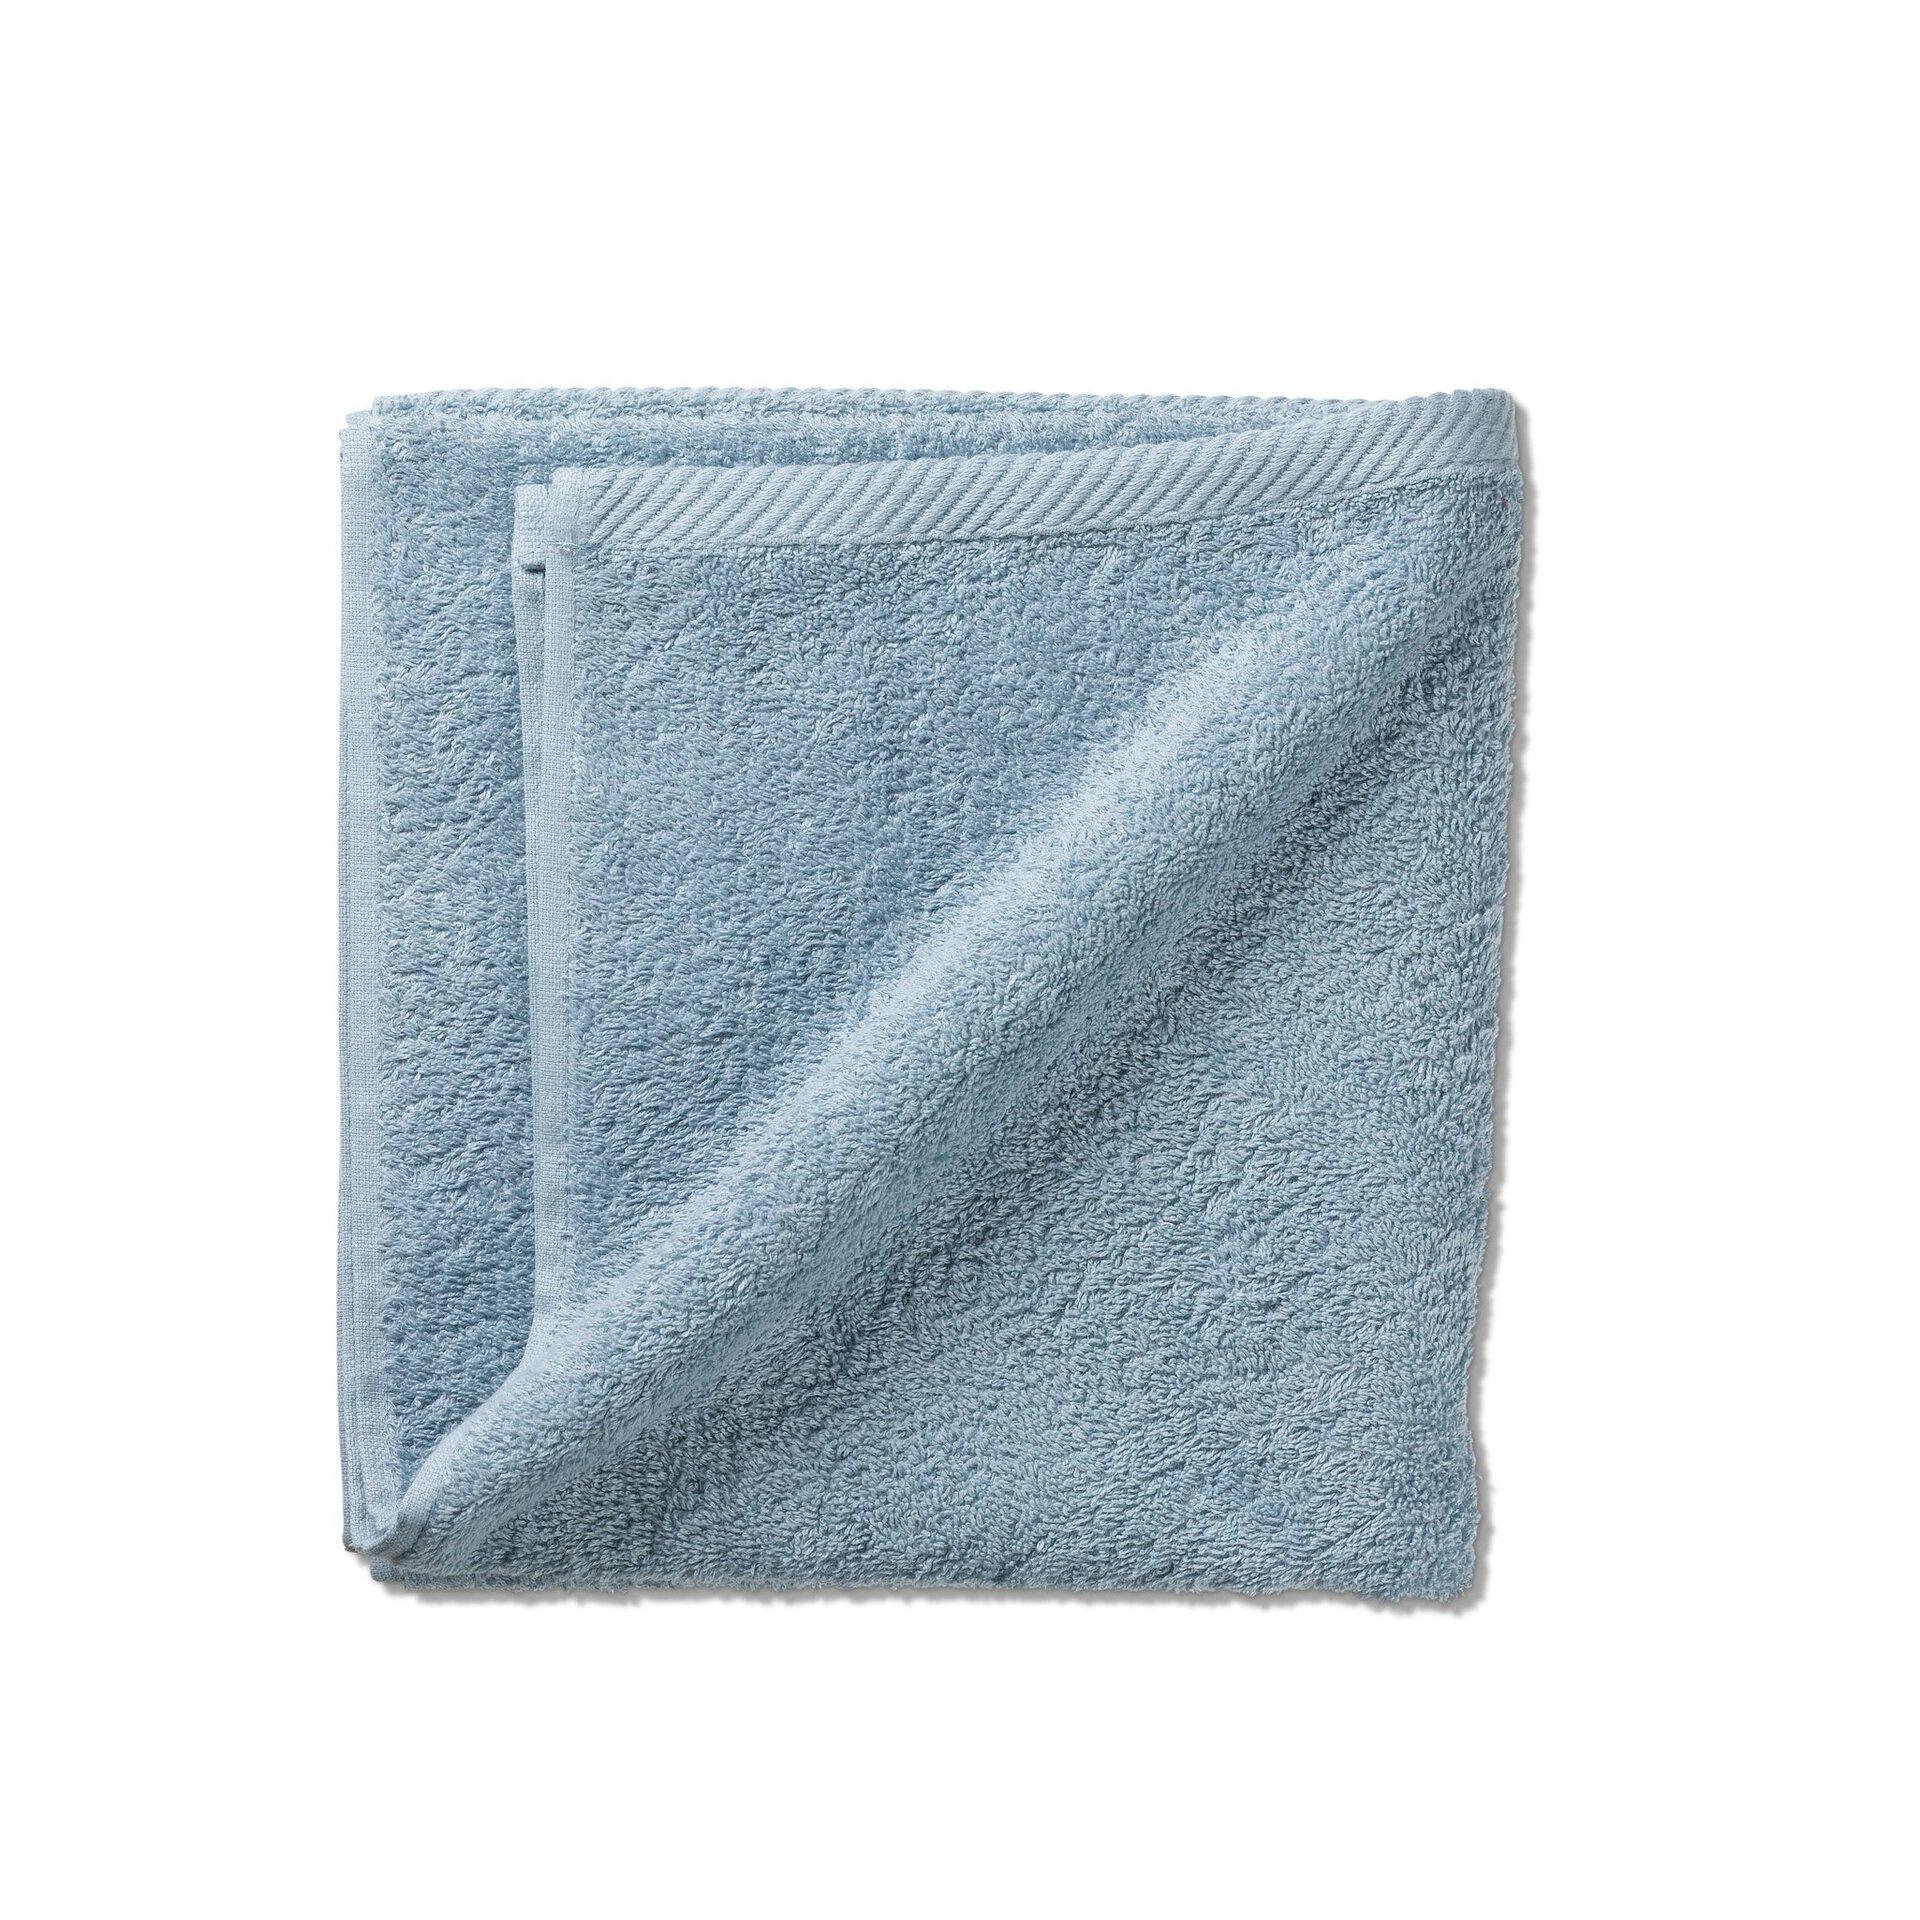 Handtuch Ladessa Kela Textil Blau